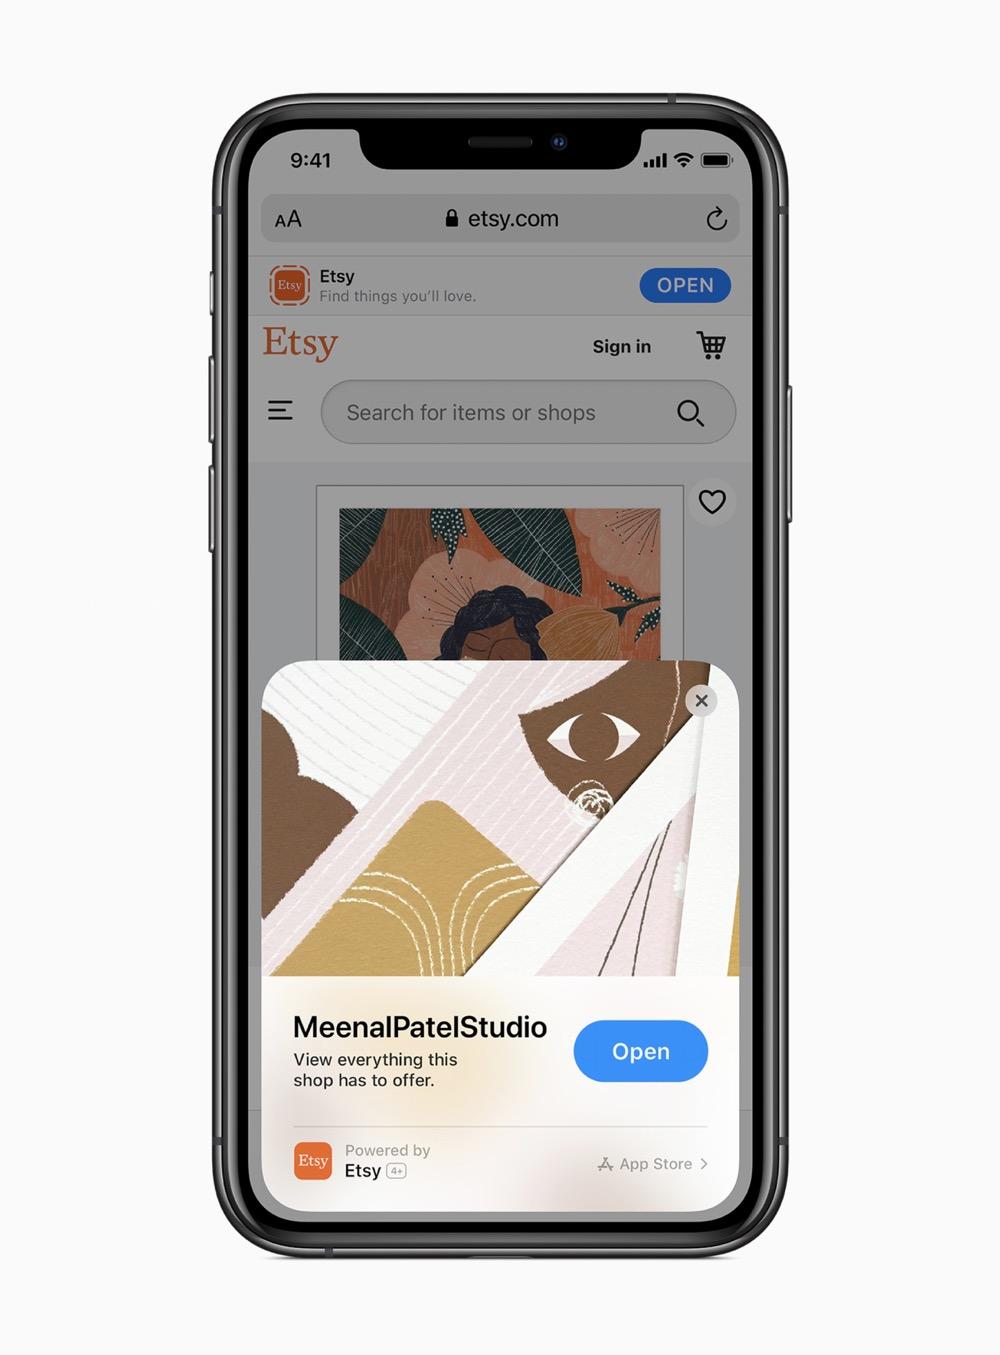 Apple ios14 app clips etsy app screen 06222020